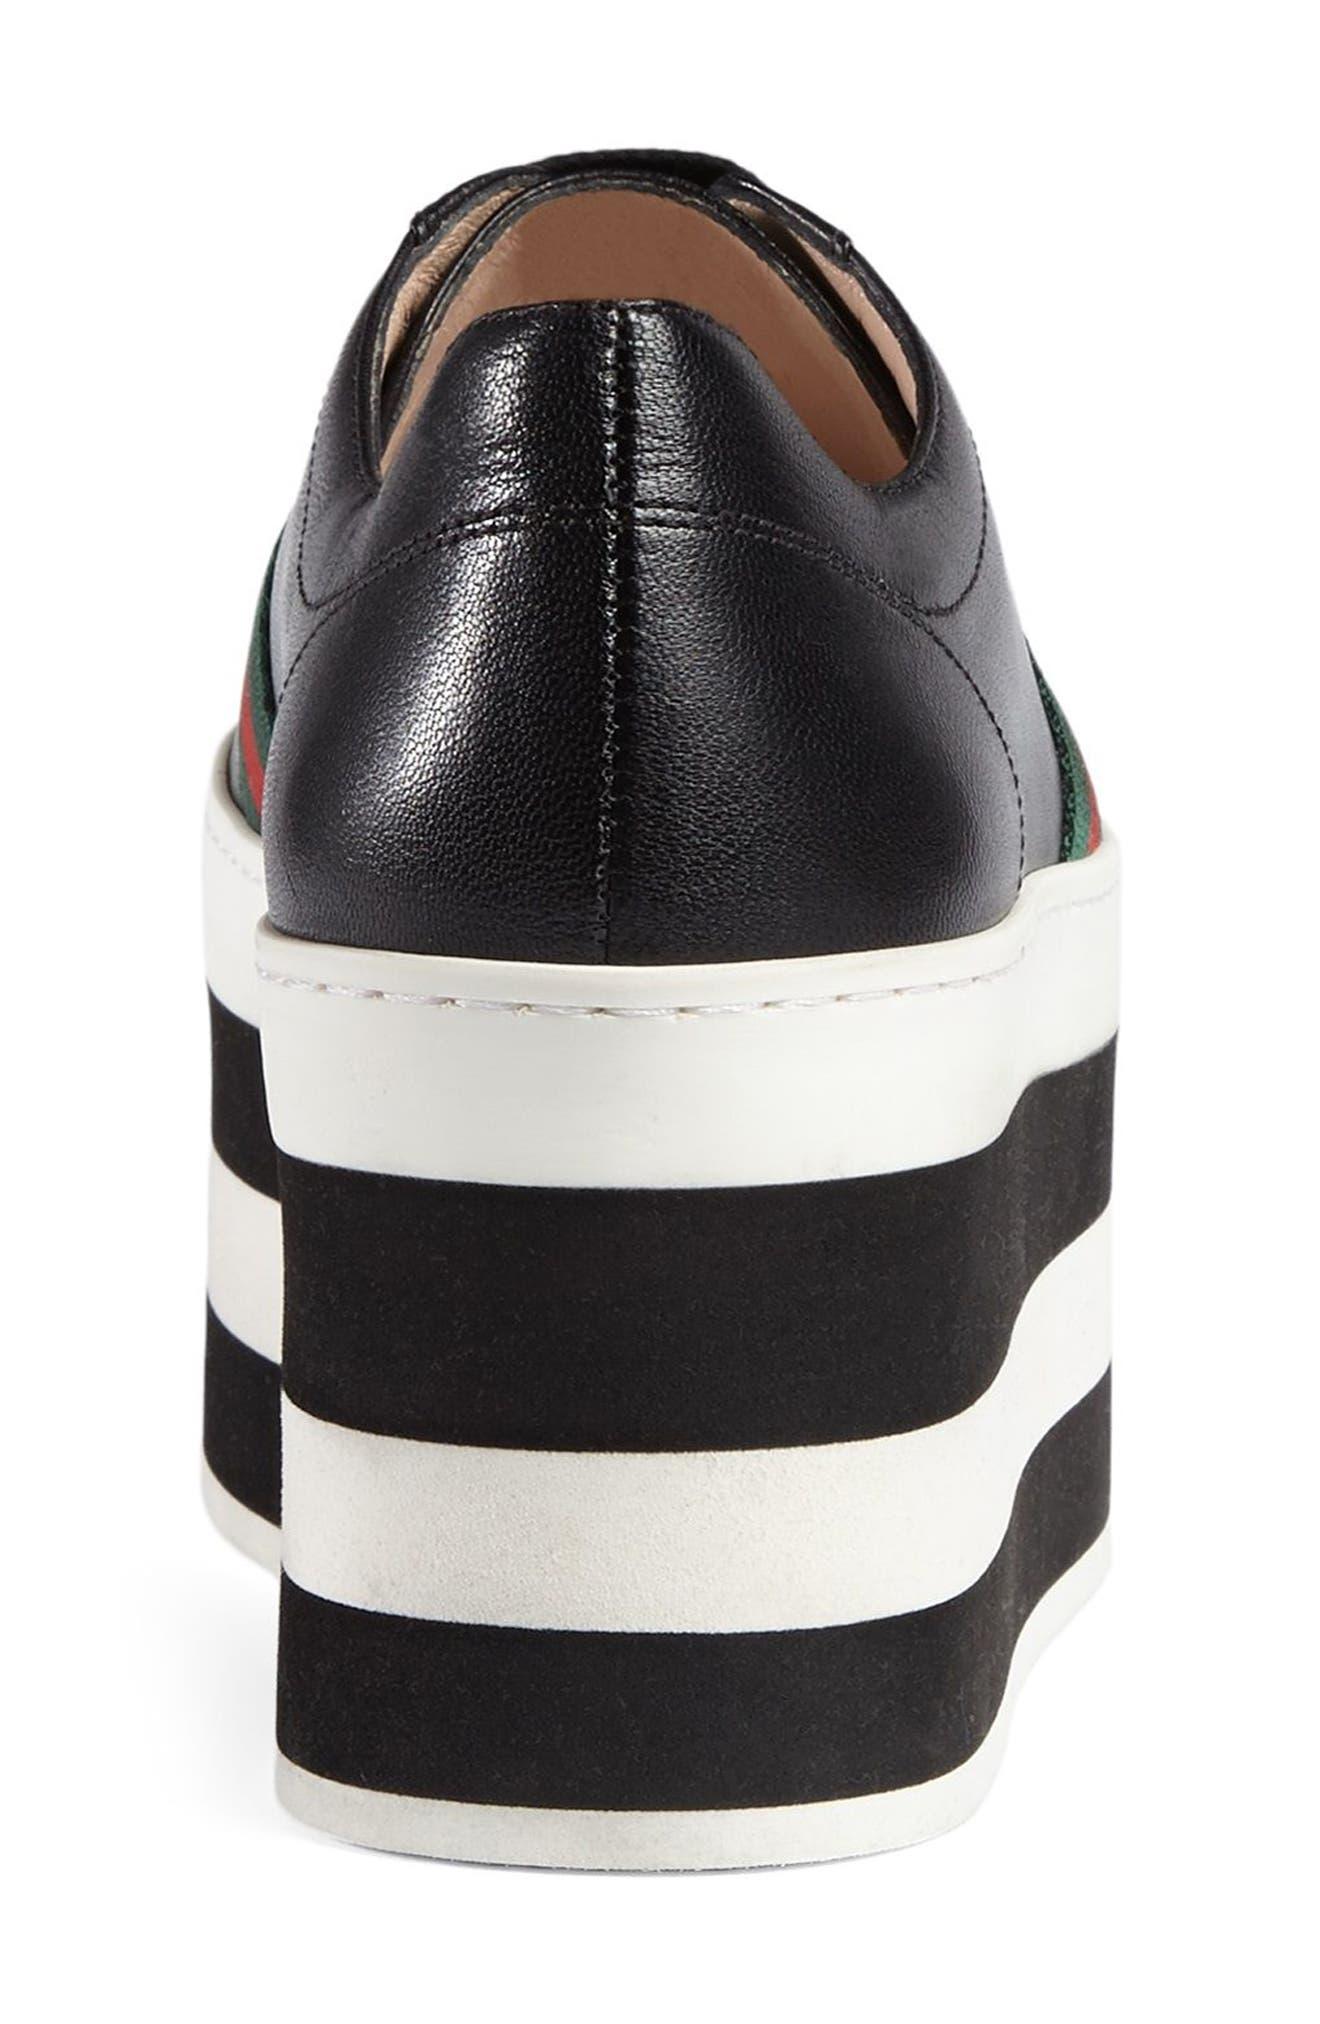 Peggy Flatform Sneaker,                             Alternate thumbnail 2, color,                             001